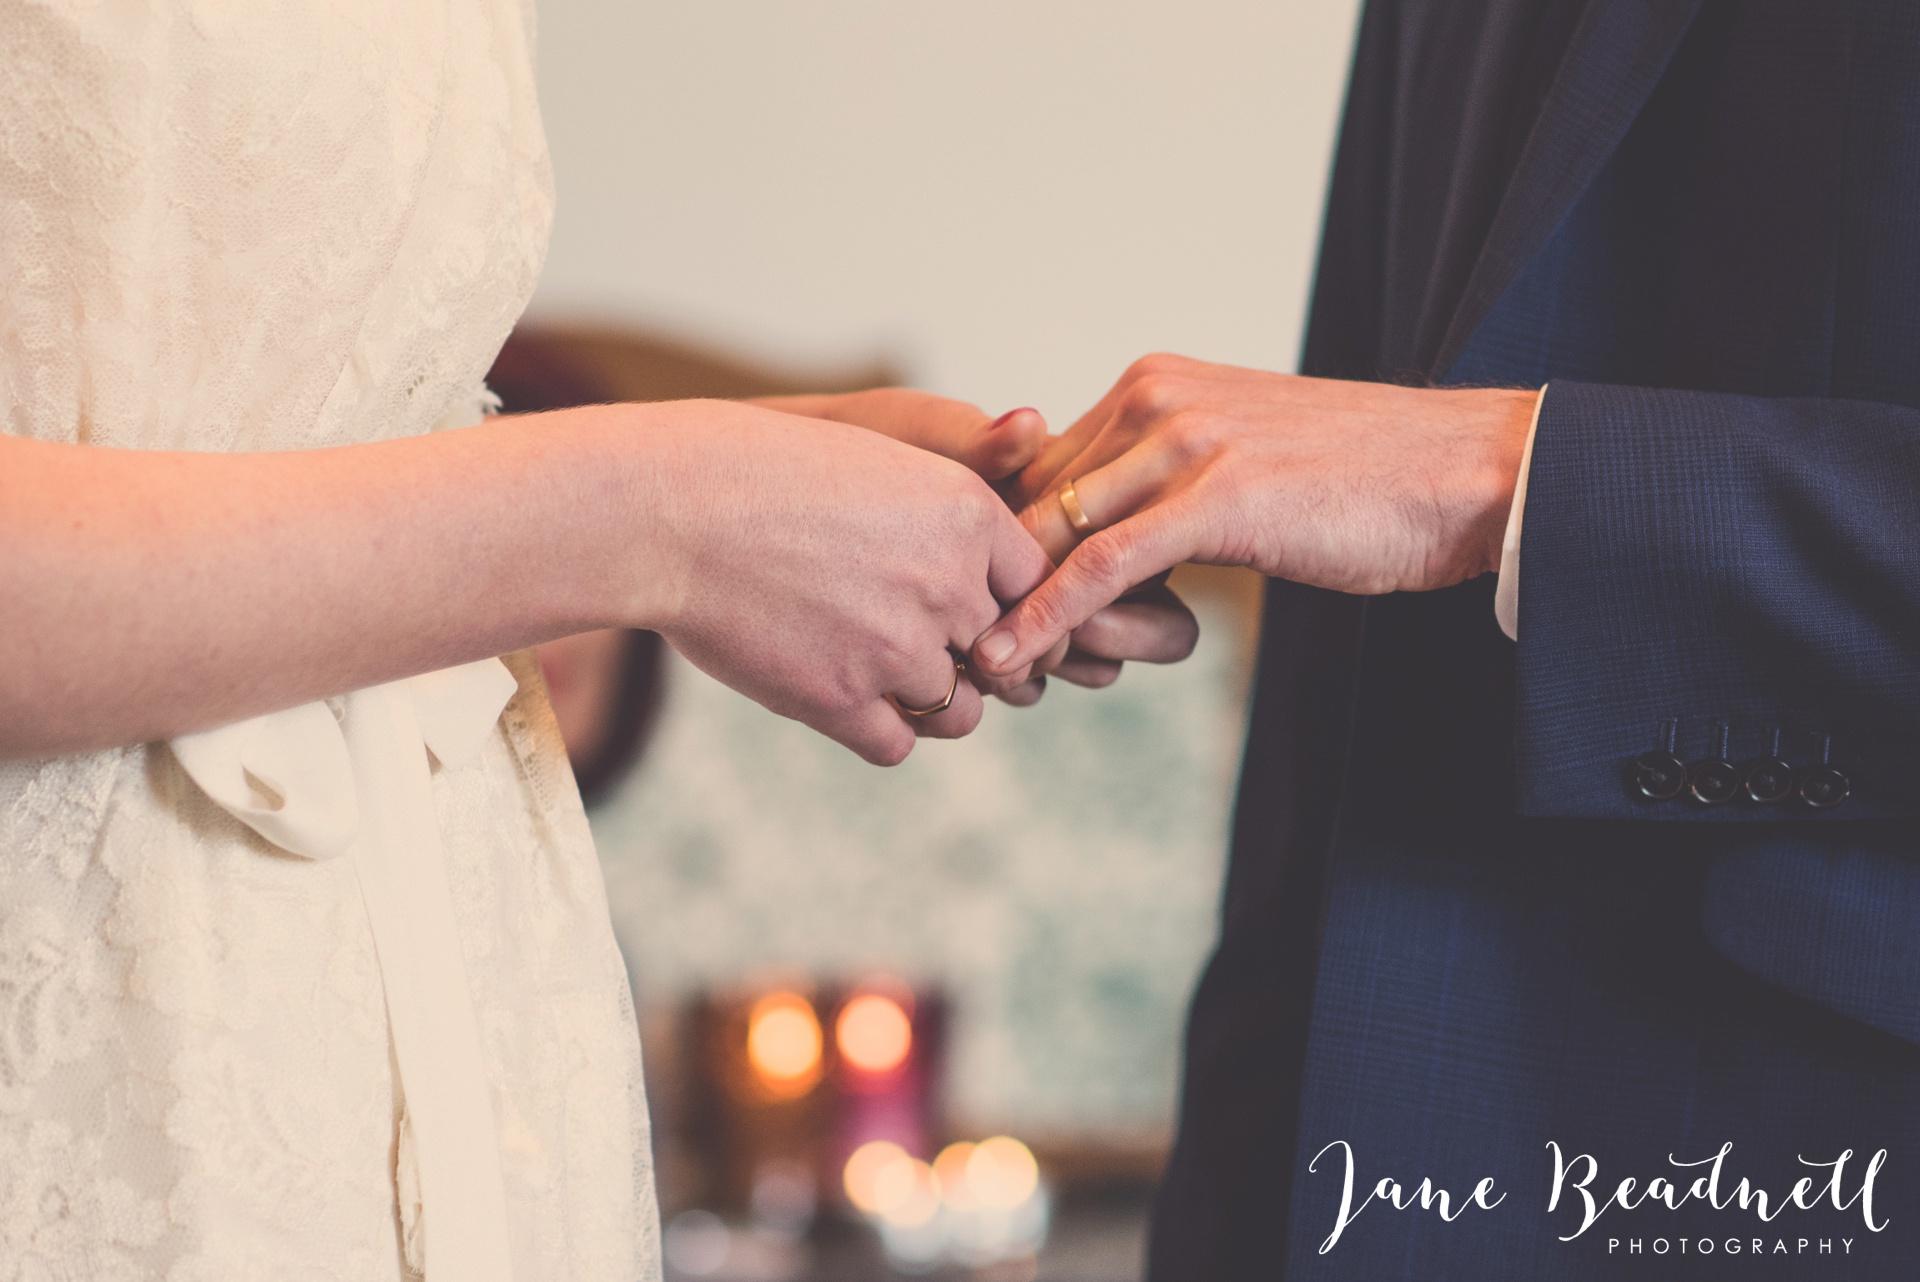 Jane Beadnell fine art wedding photographer The Cheerful Chilli Barn Otley_0019